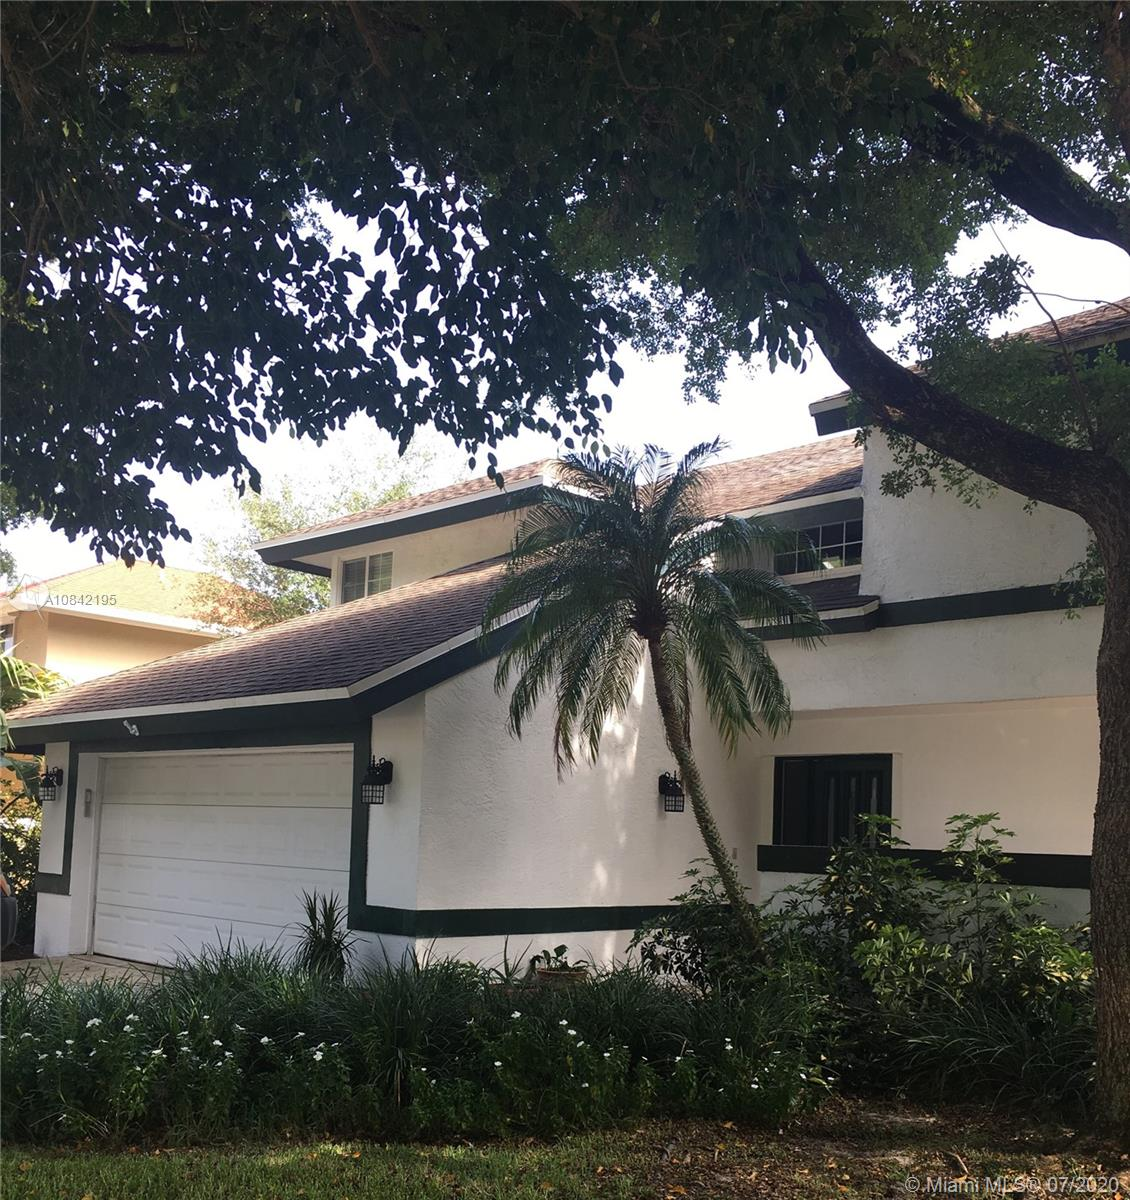 6654 Sweet Maple Ln, Boca Raton, FL 33433